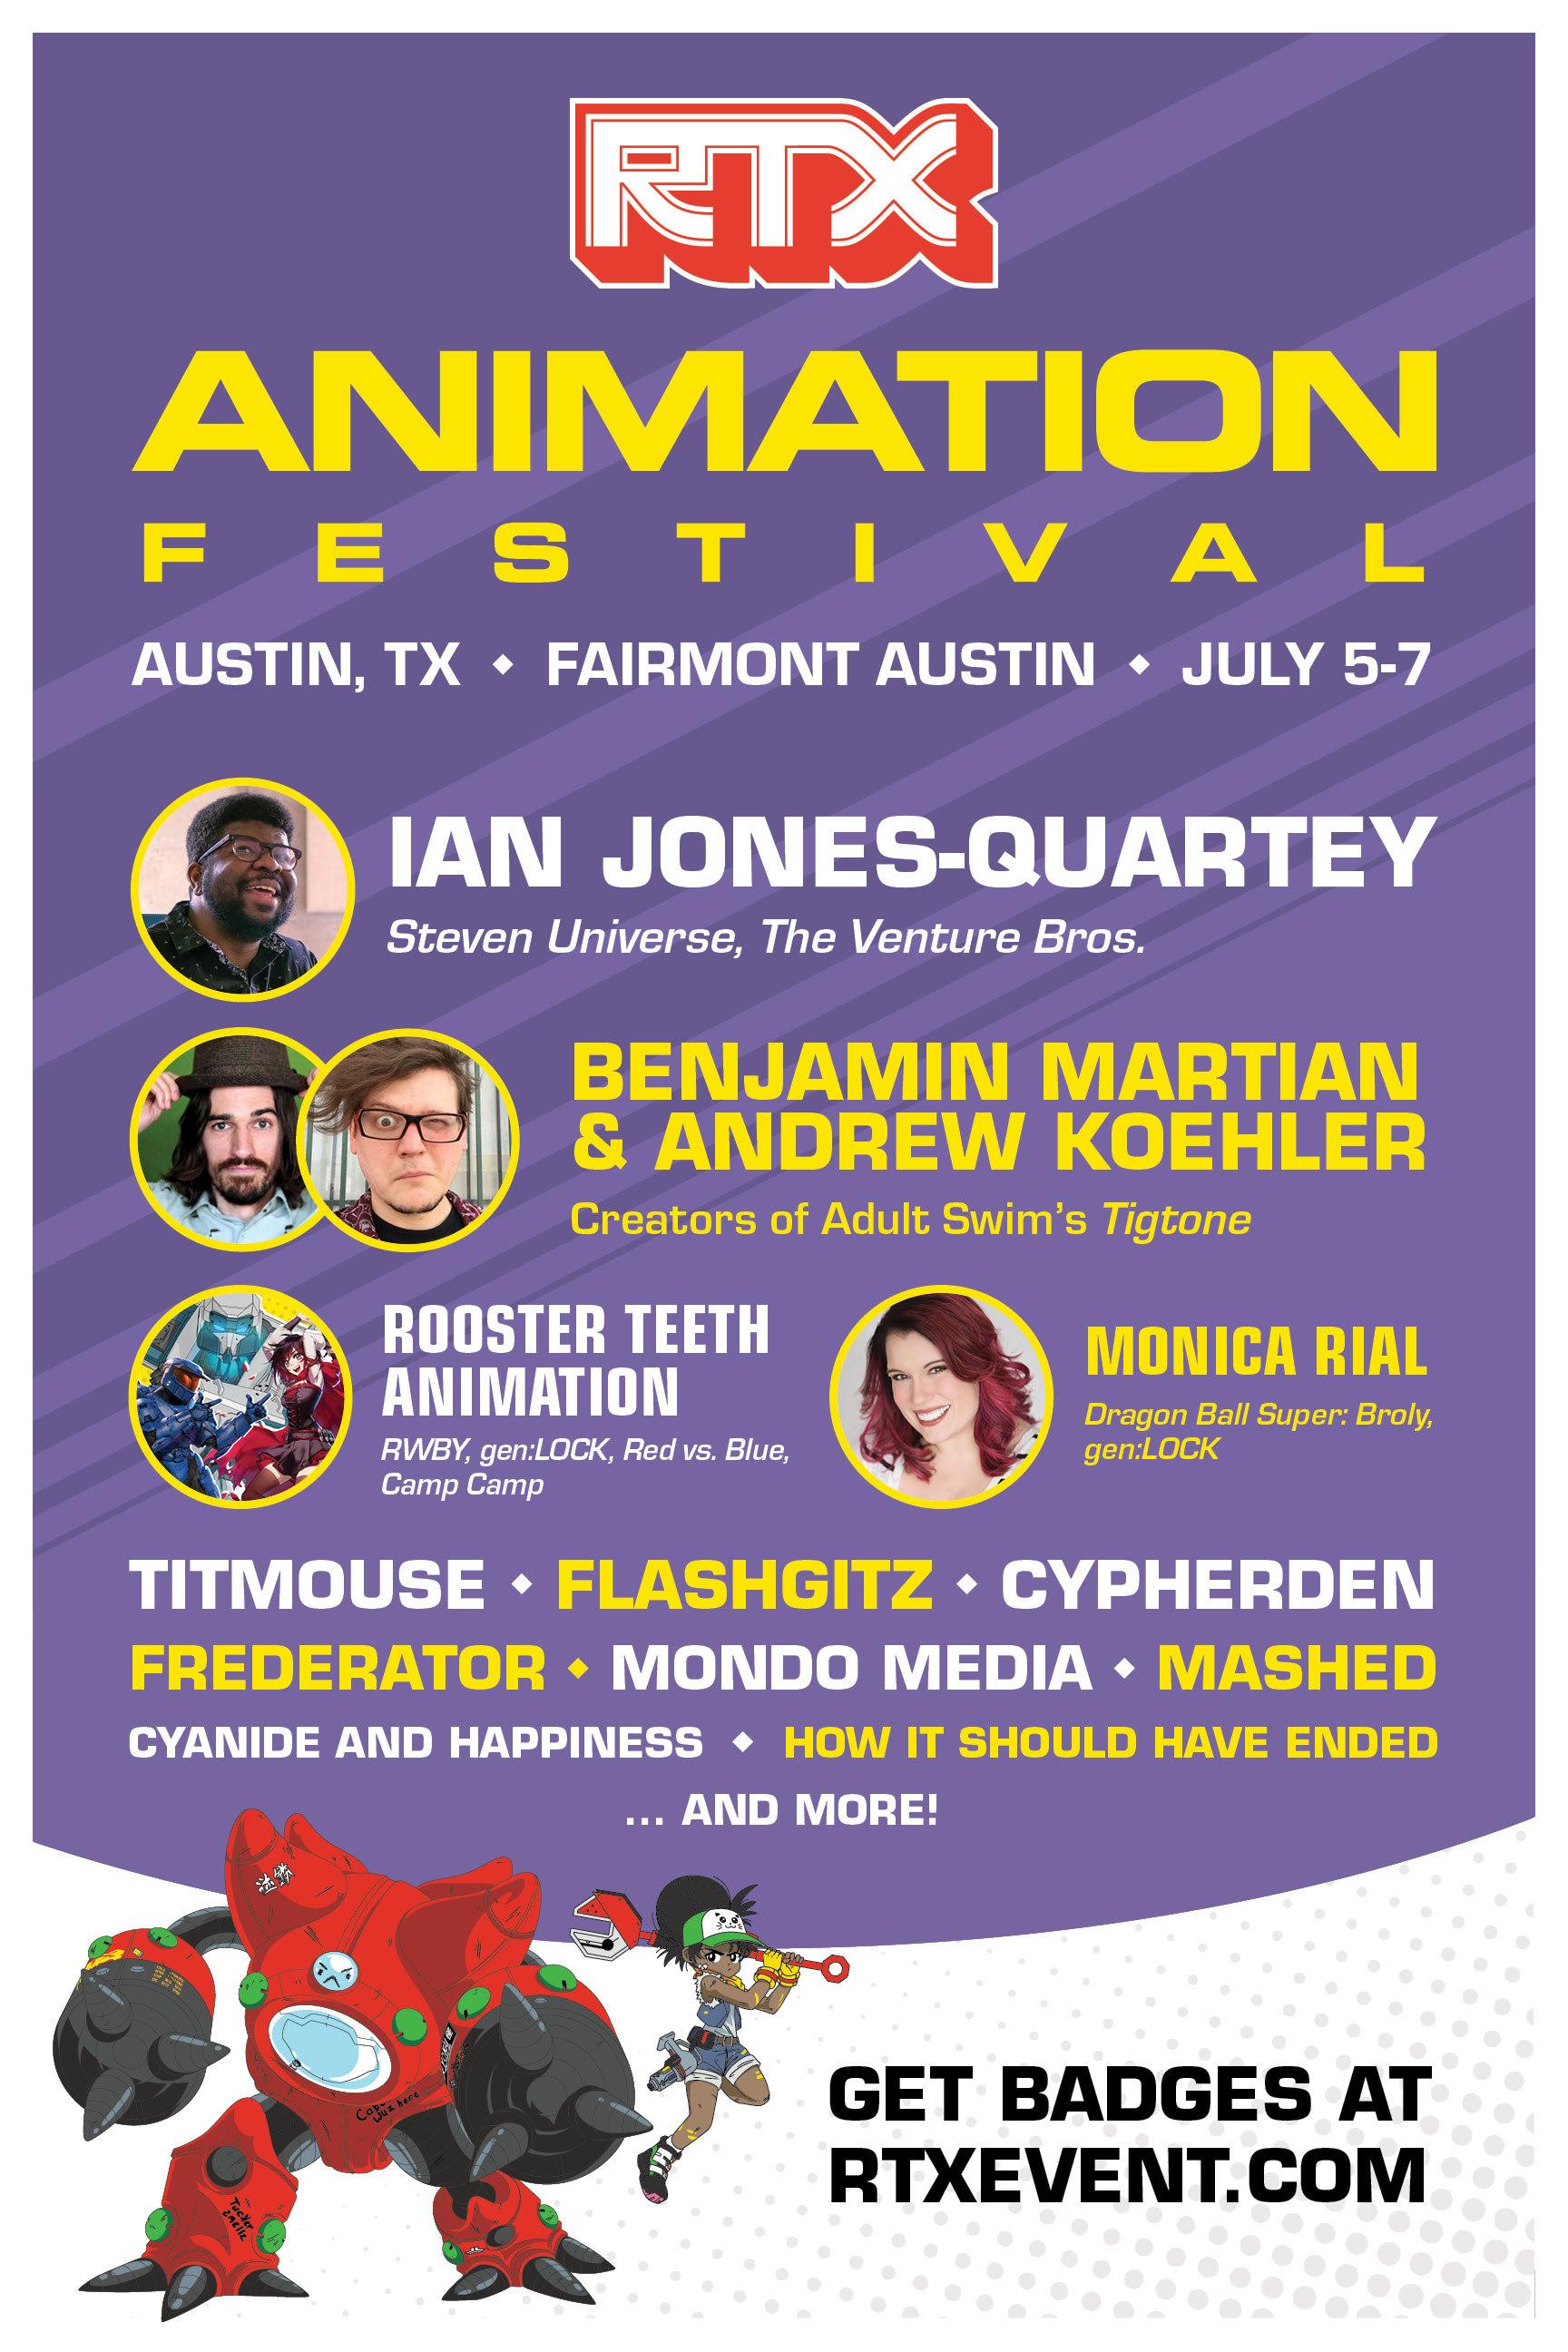 RTX Animation Festival Announces Initial 2019 Lineup